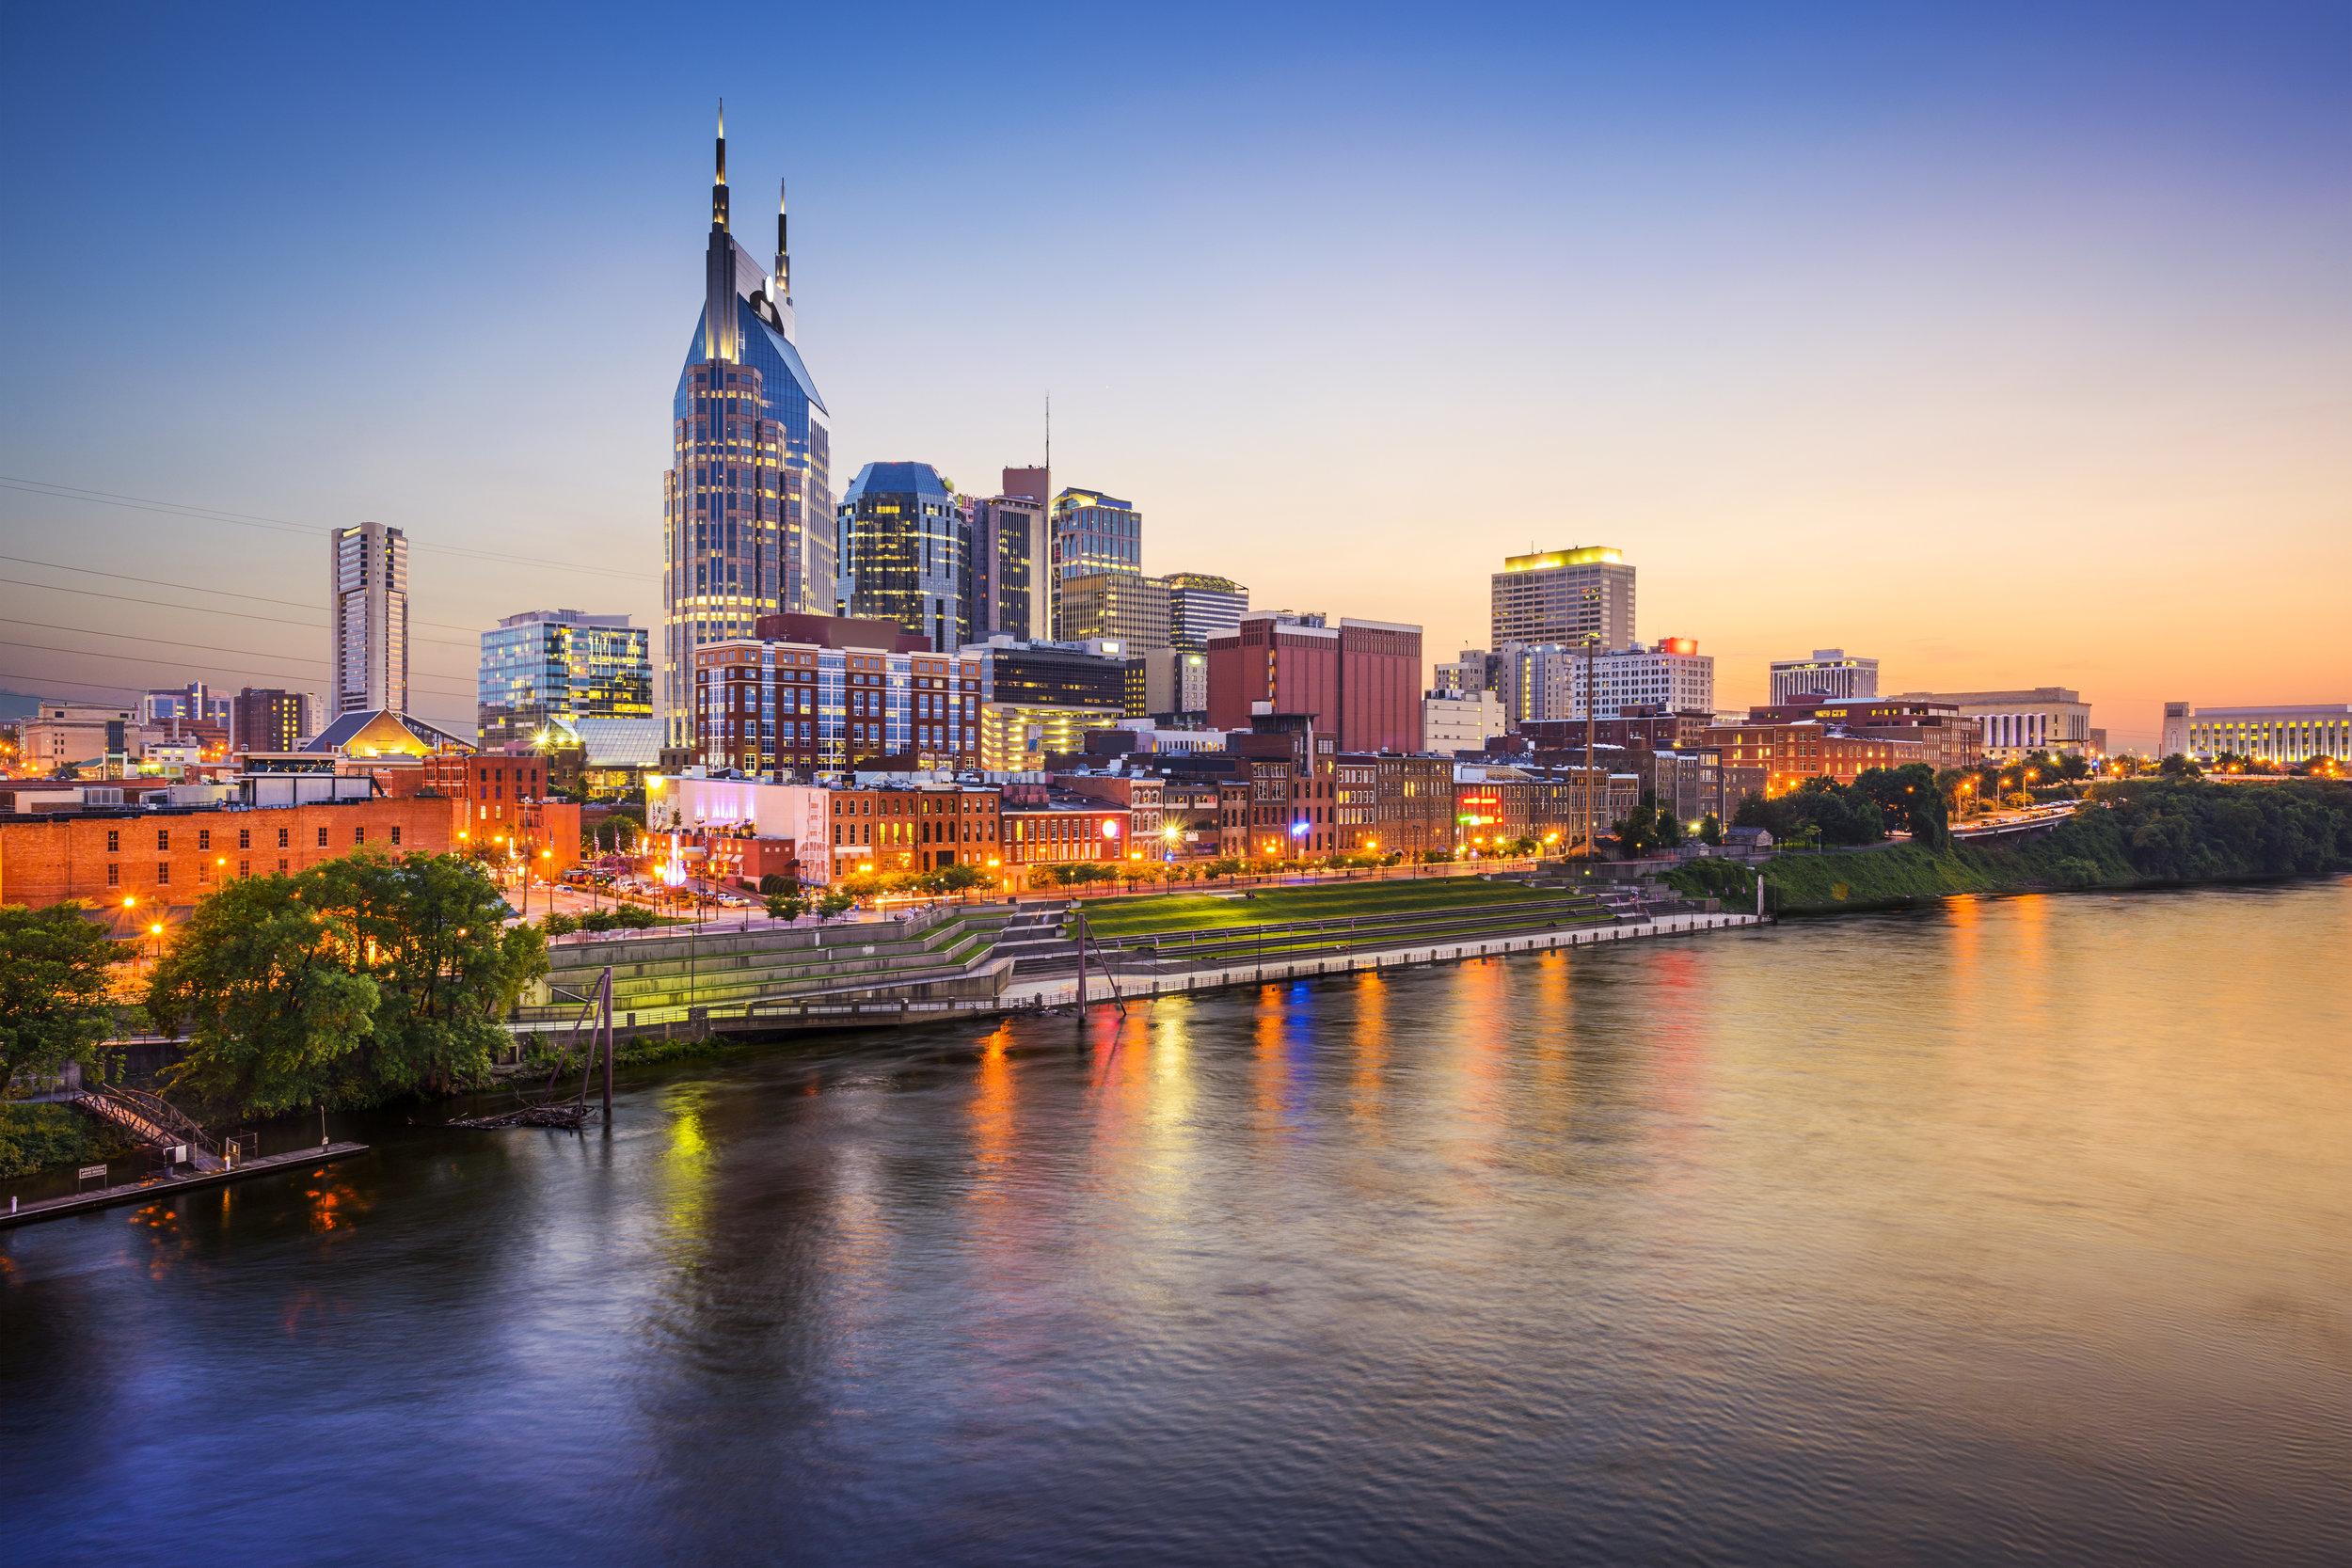 Nashville Riverfront.jpeg